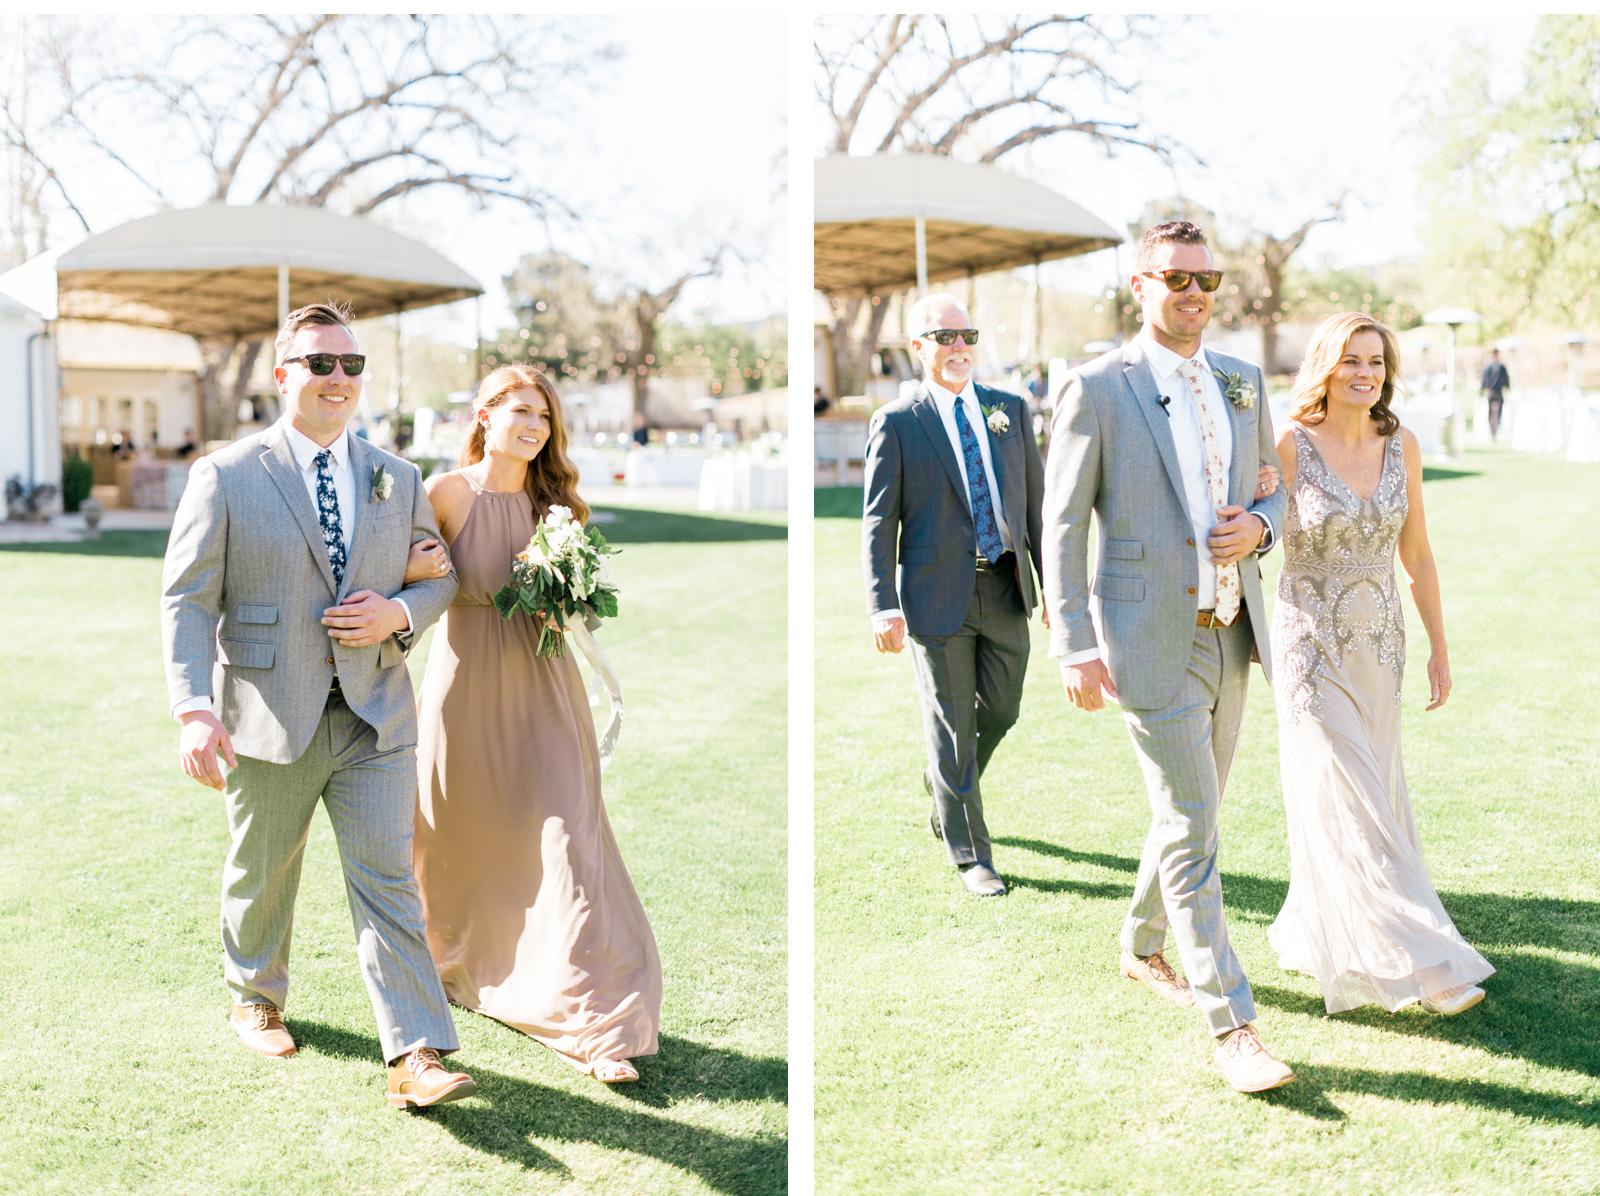 Malibu-Wedding-Photographer-Dani-Piercy-Inspired-by-This-Triunfo-Creek-Wedding-Natalie-Schutt-Photography_06.jpg